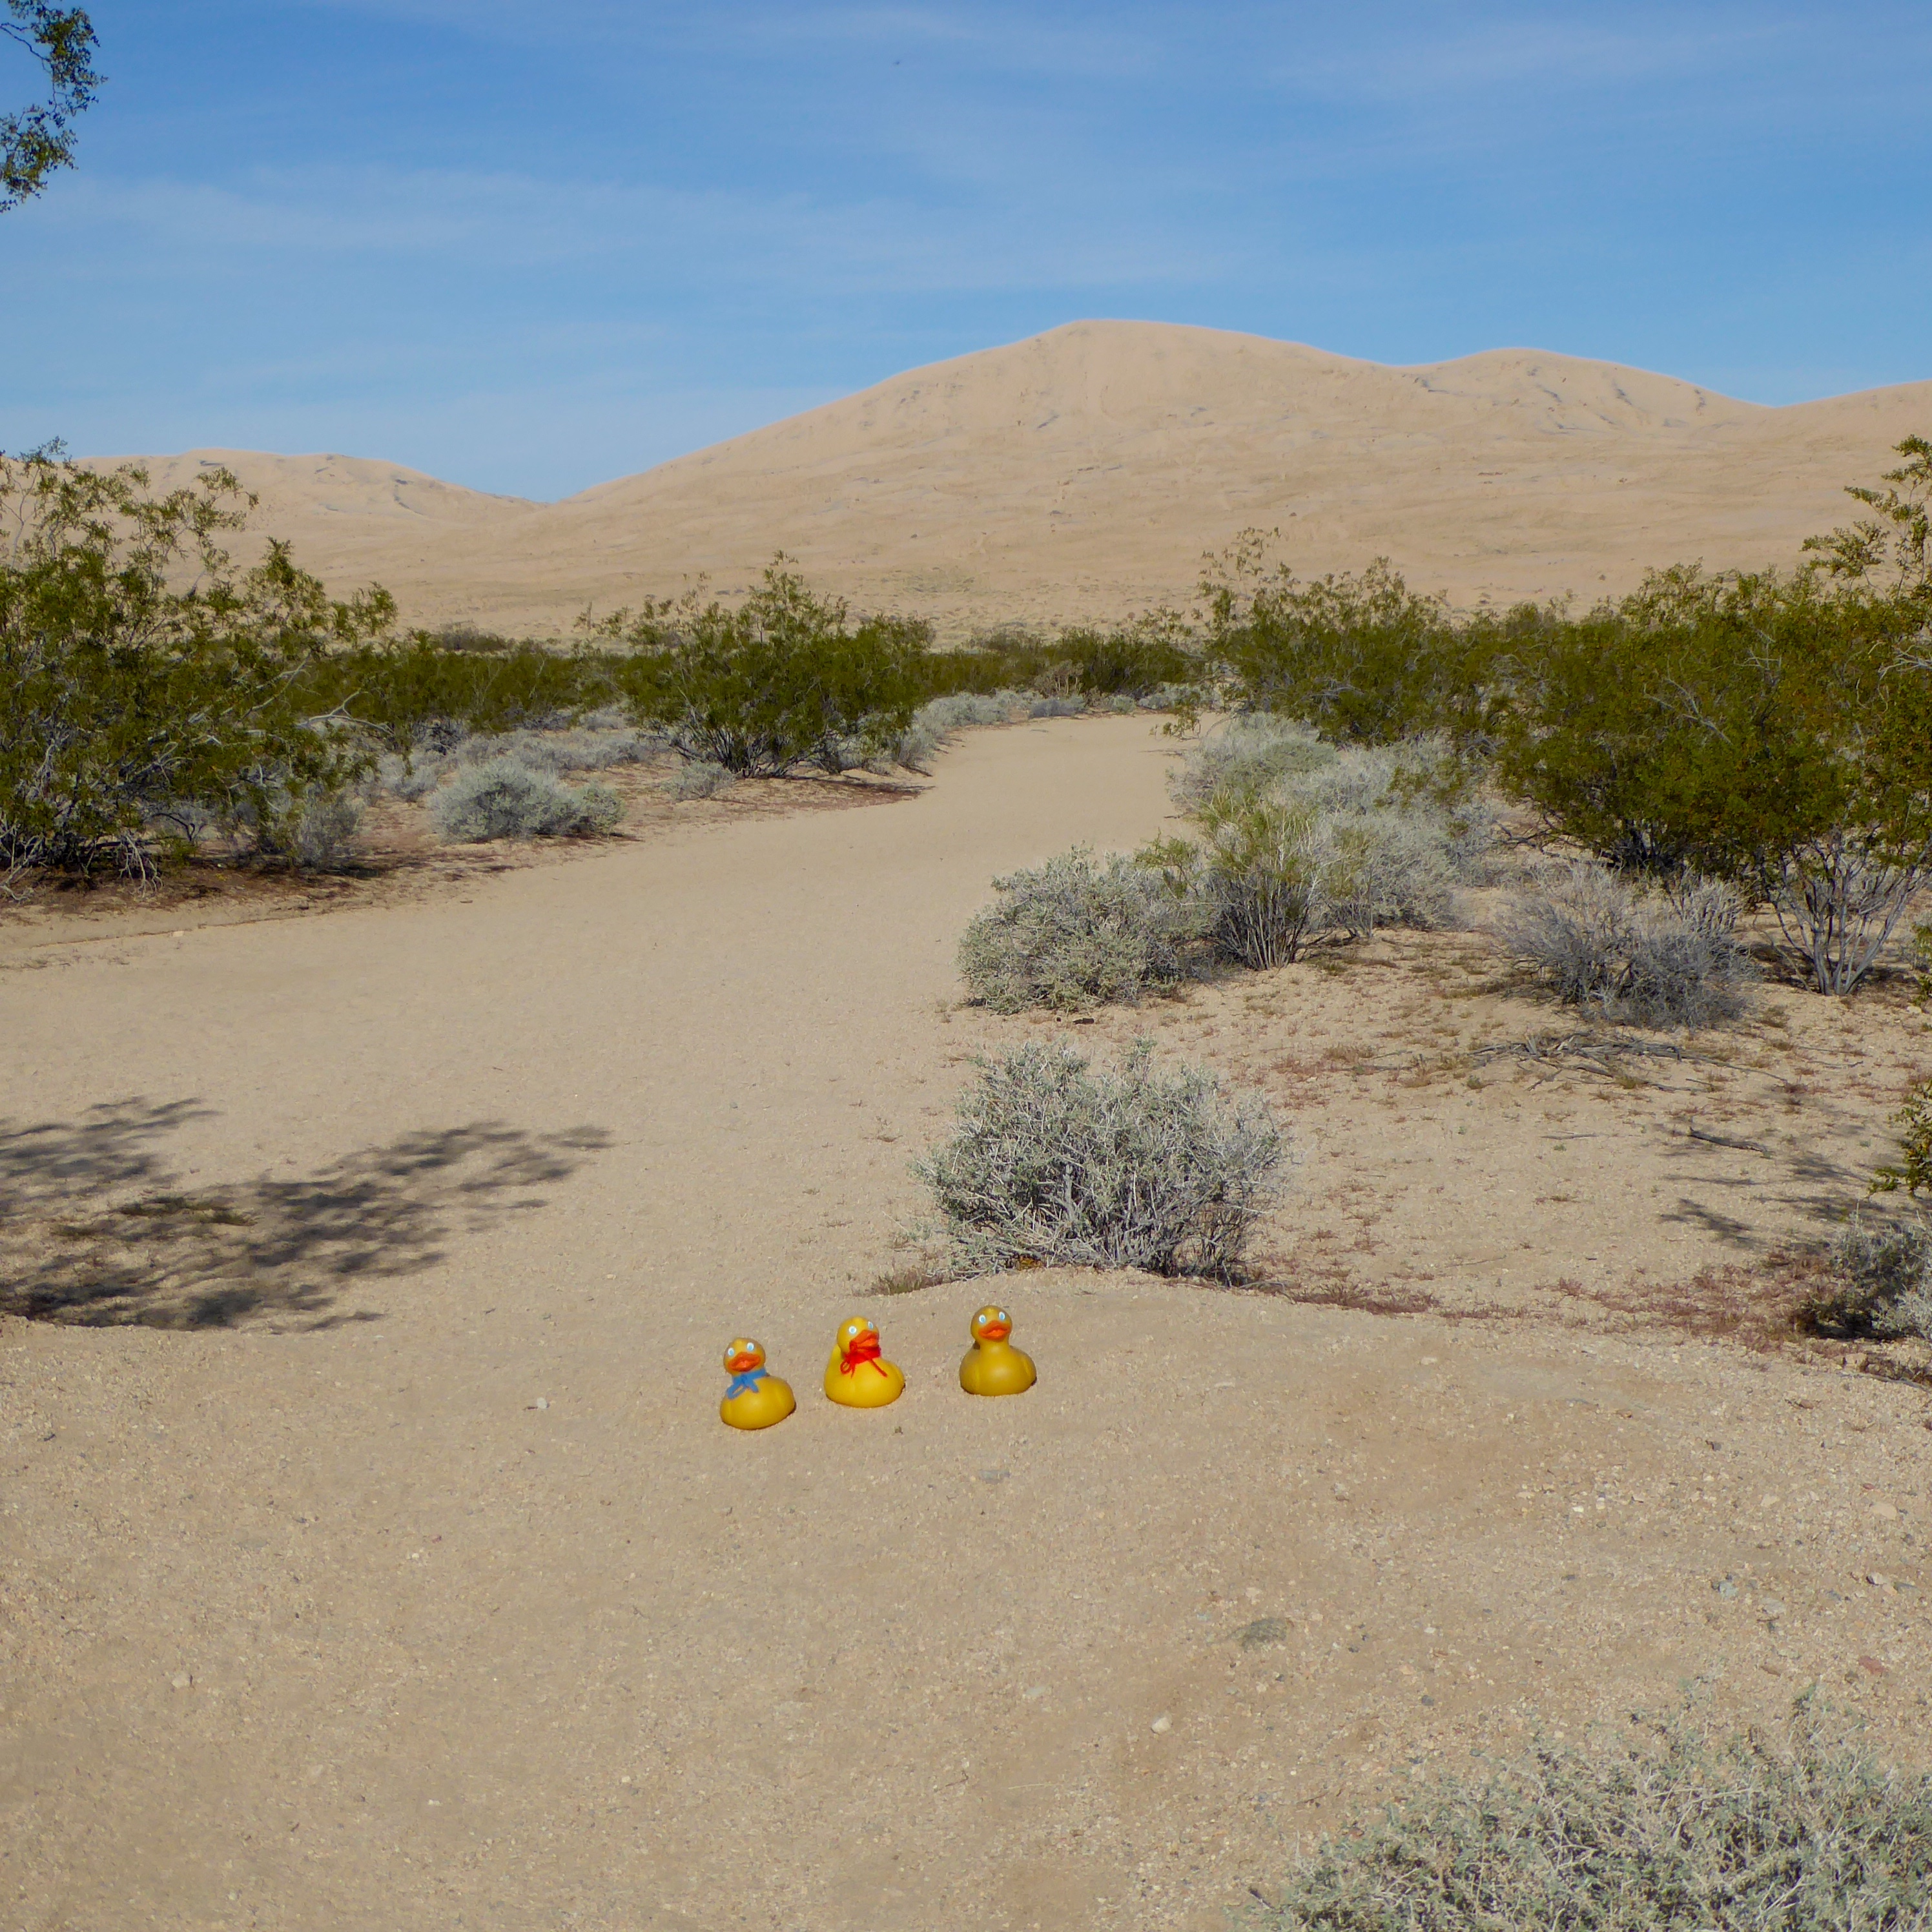 Mojave Desert Native Plants: The Colorado Traveling Ducks Visit The Mojave Desert